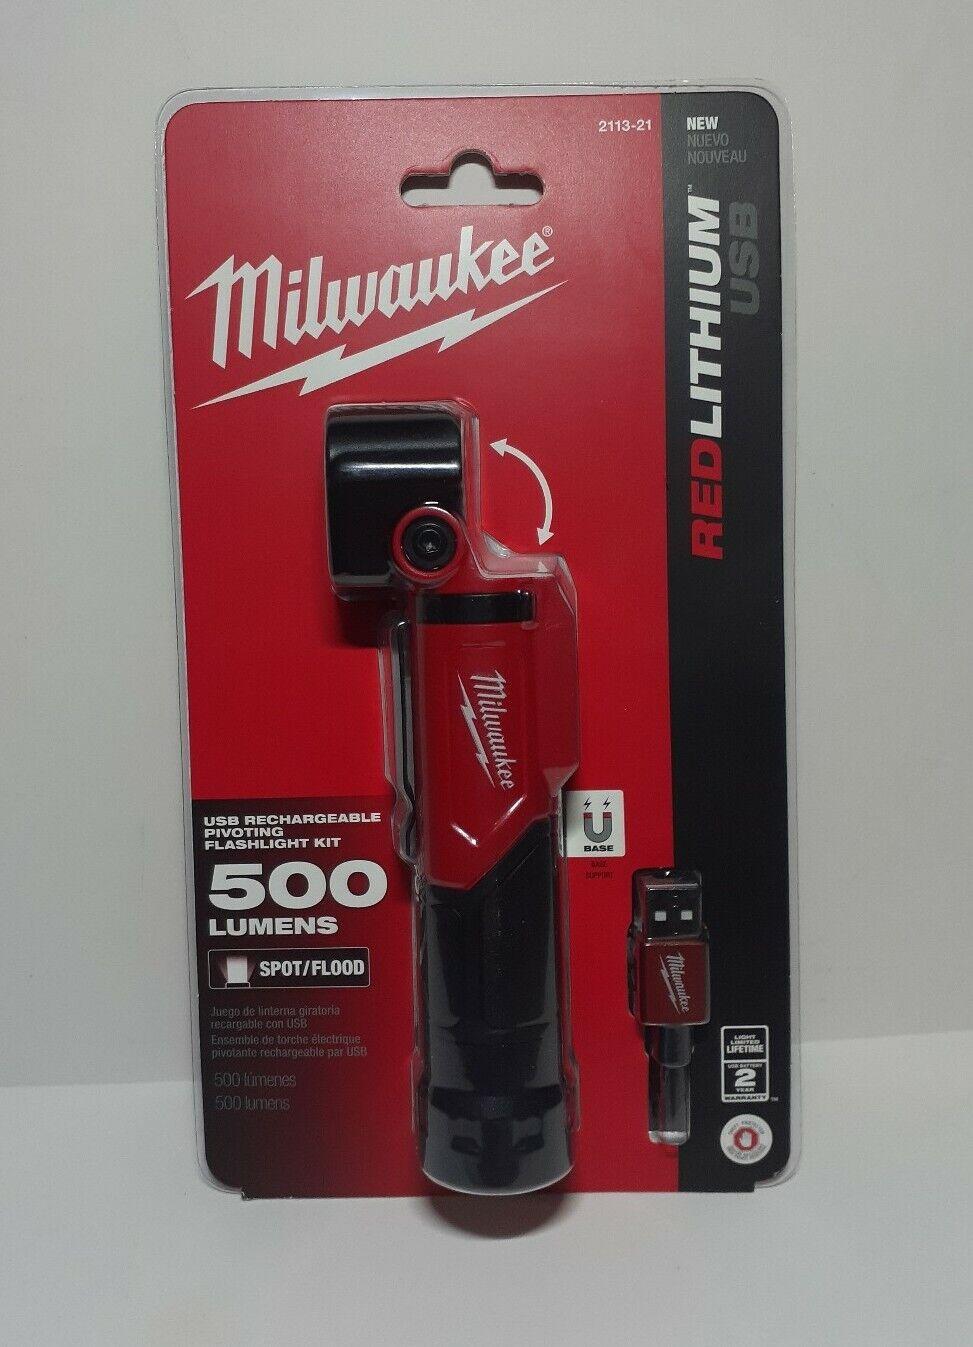 3 Lighting modes #2113-21 Milwaukee USB Rechargeable Pivoting Head LED Light